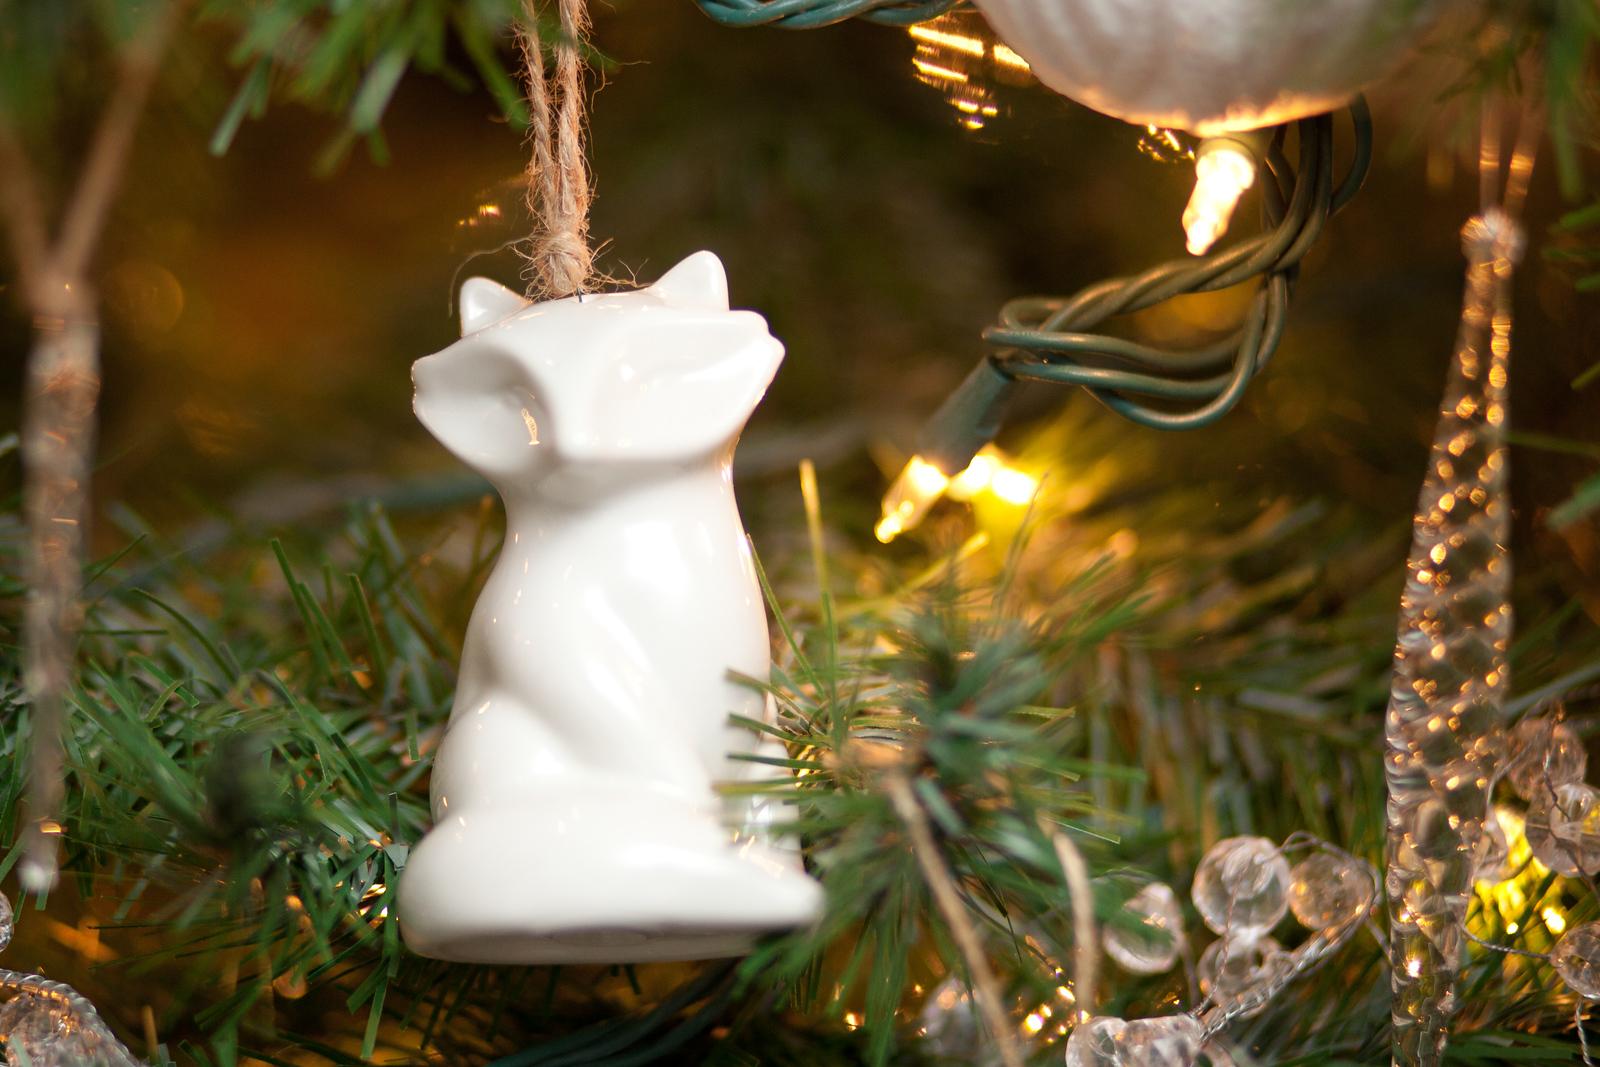 Target Threshold Fox Salt Shaker as Ornament